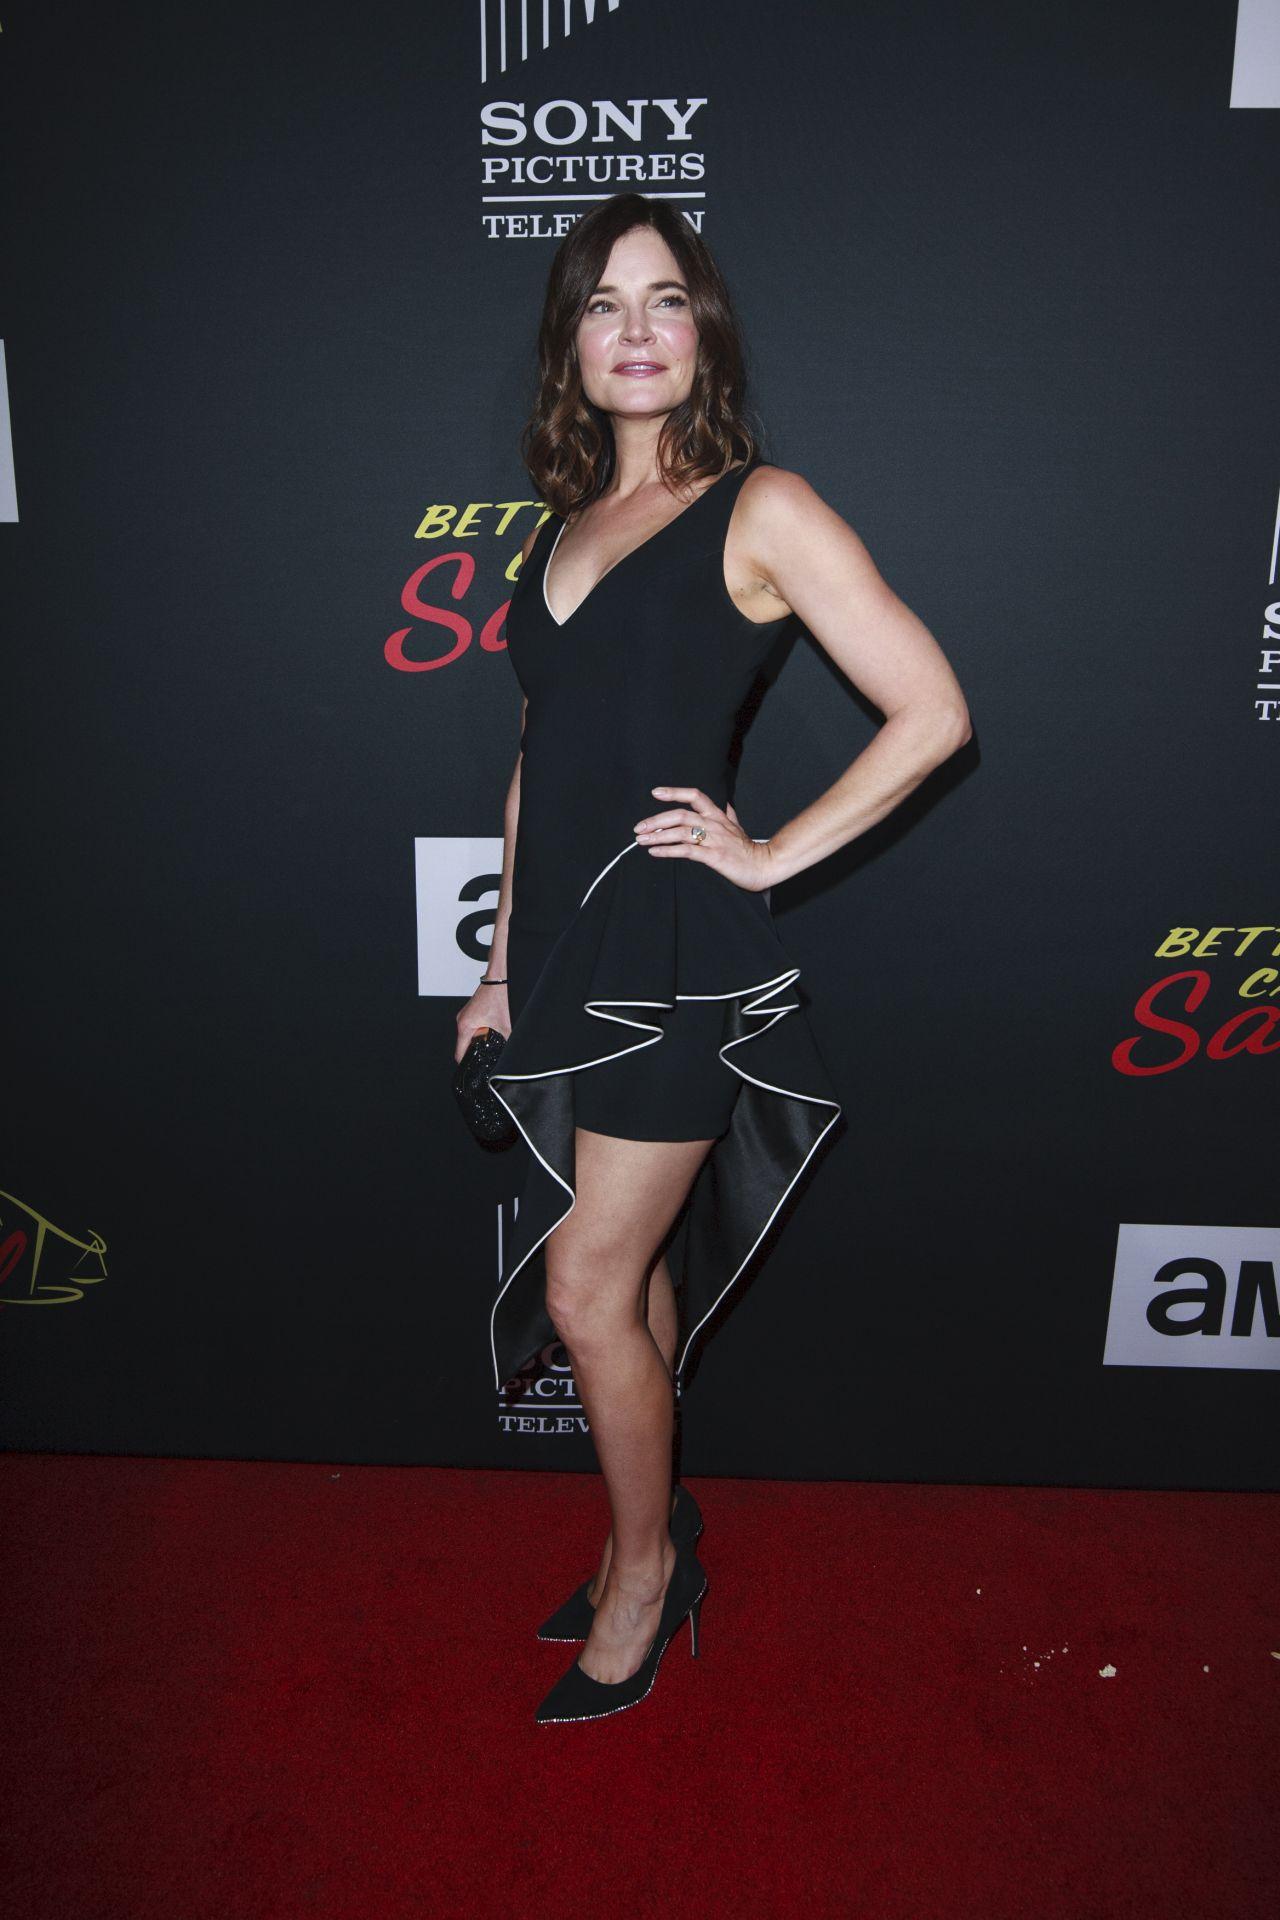 Betsy Brandt Better Call Saul Season 4 Premiere At